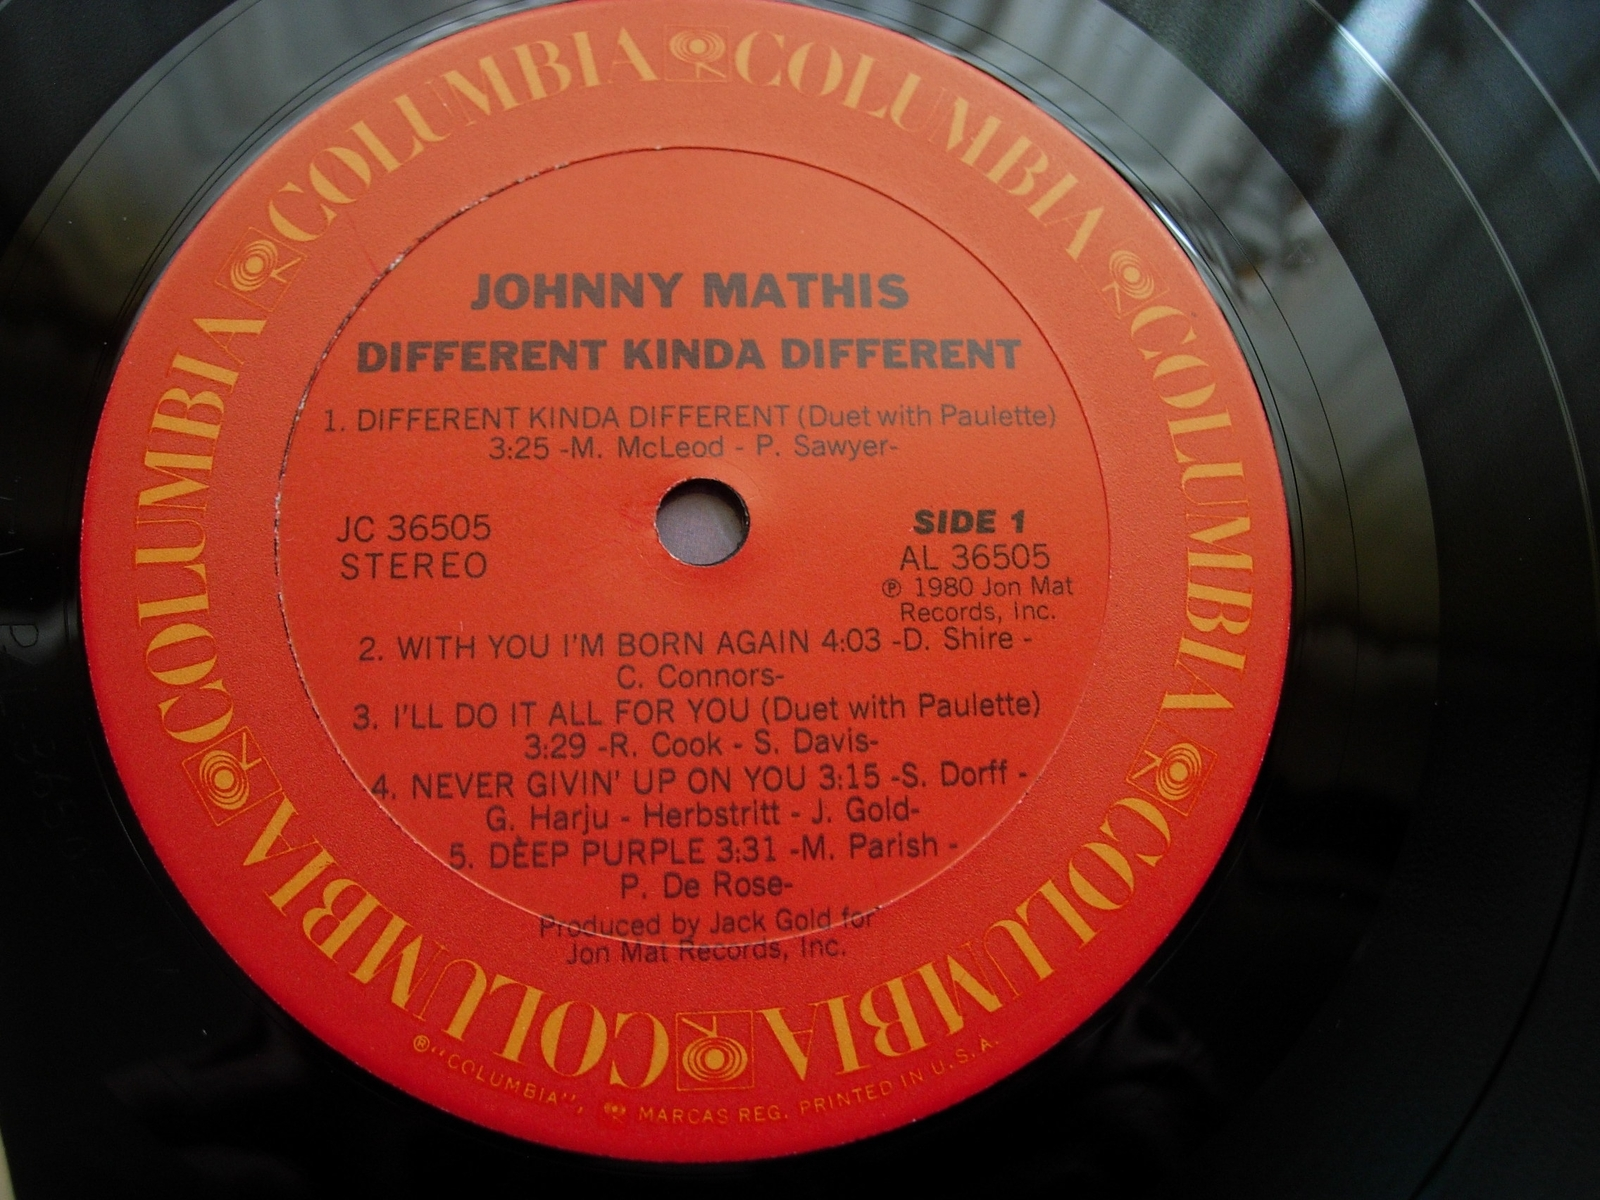 Johnny Mathis - Different Kinda Different - Columbia JC 36505